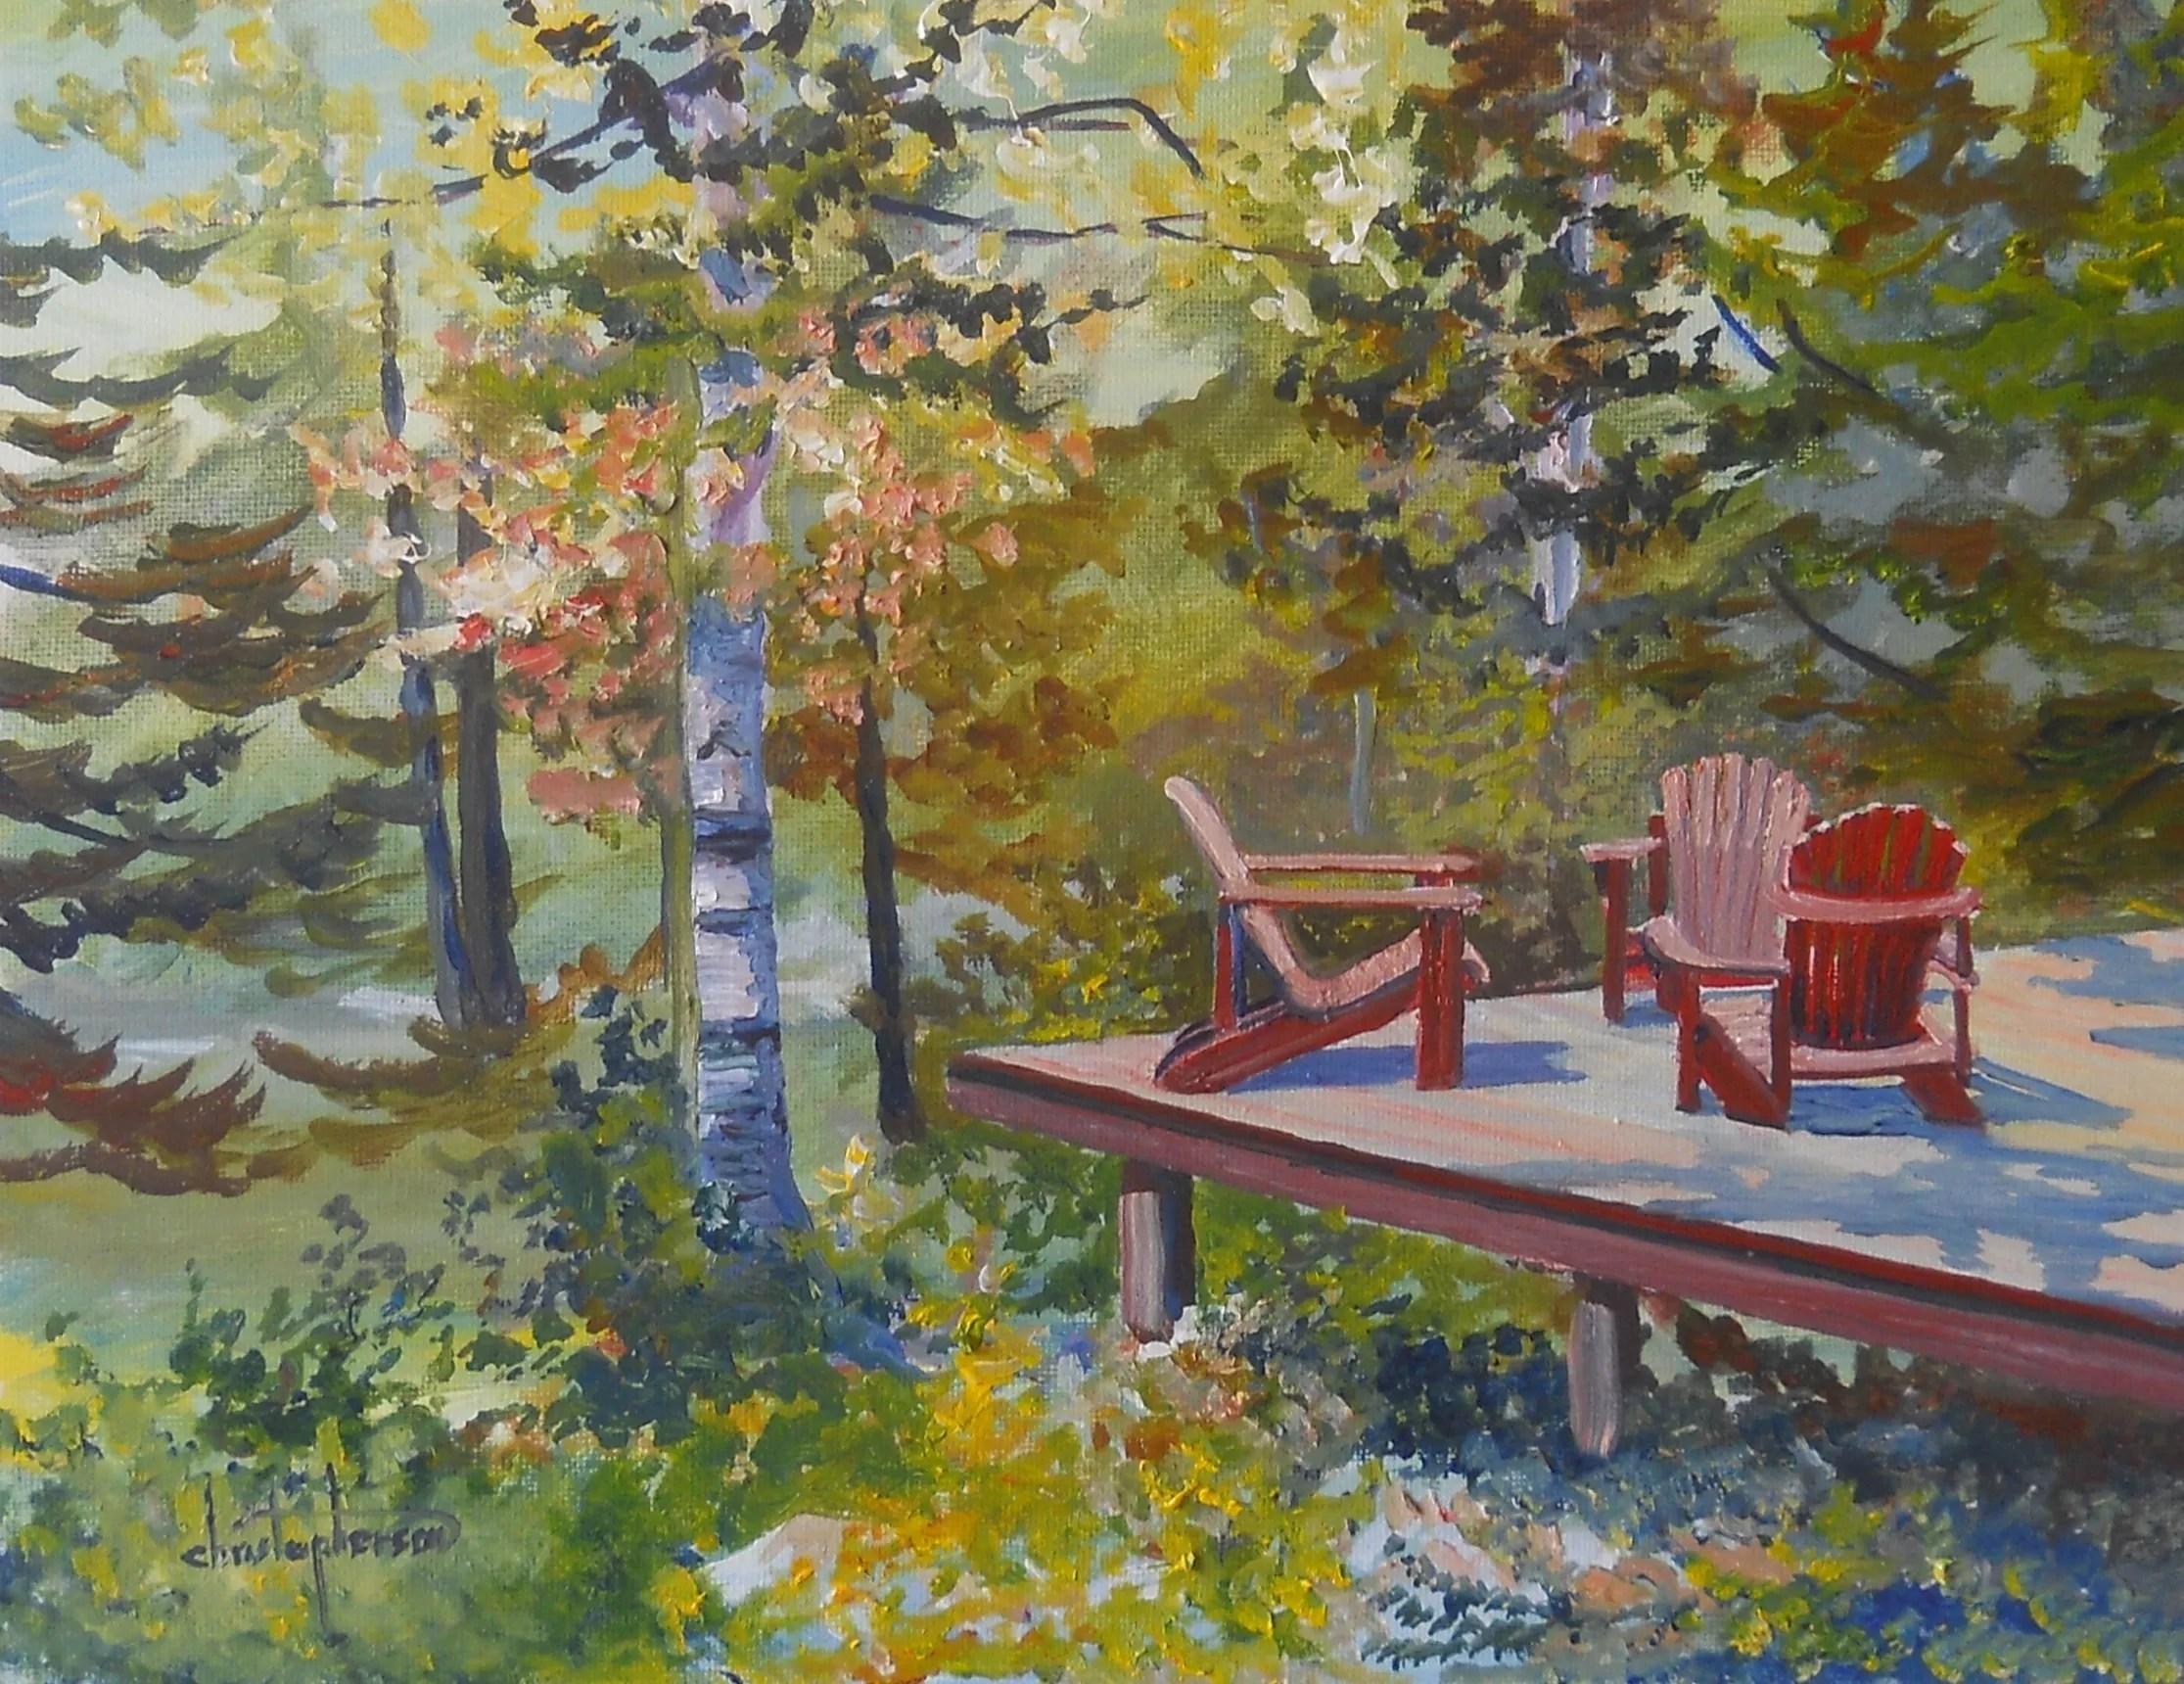 William Christopherson Artwork Adirondack Mountains Camp